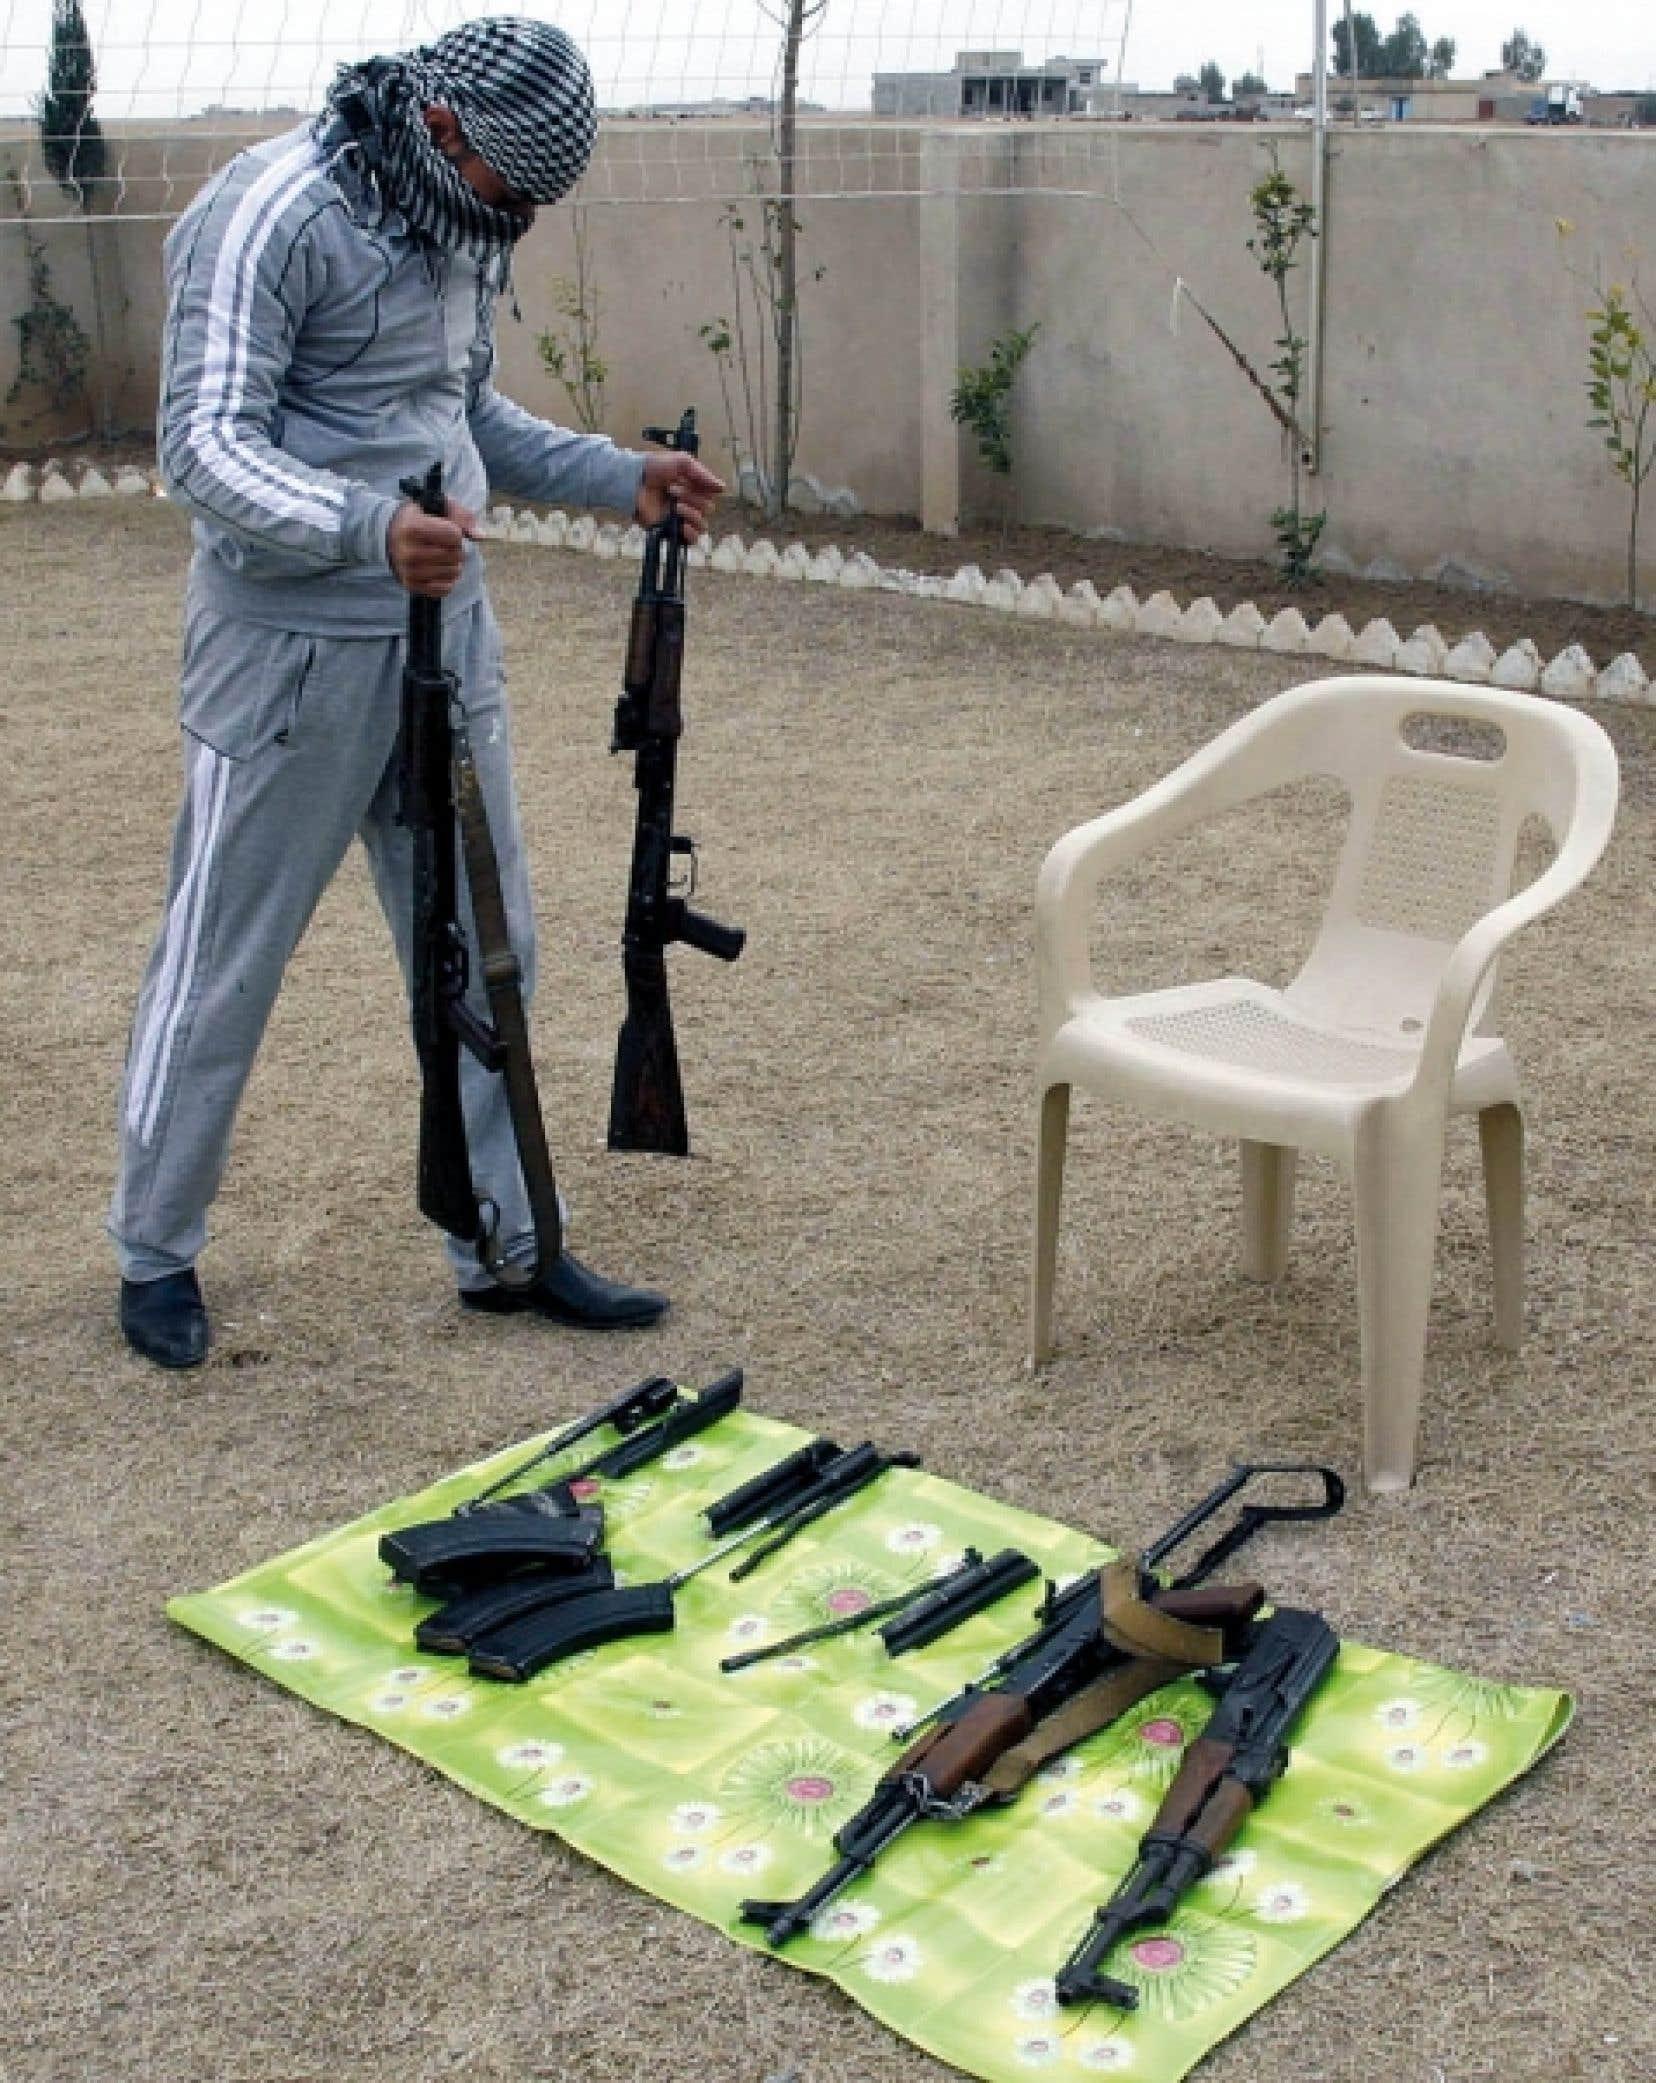 Un trafiquant irakien exposait hier sa &laquo;camelote&raquo; qui se retrouvera en Syrie.<br />